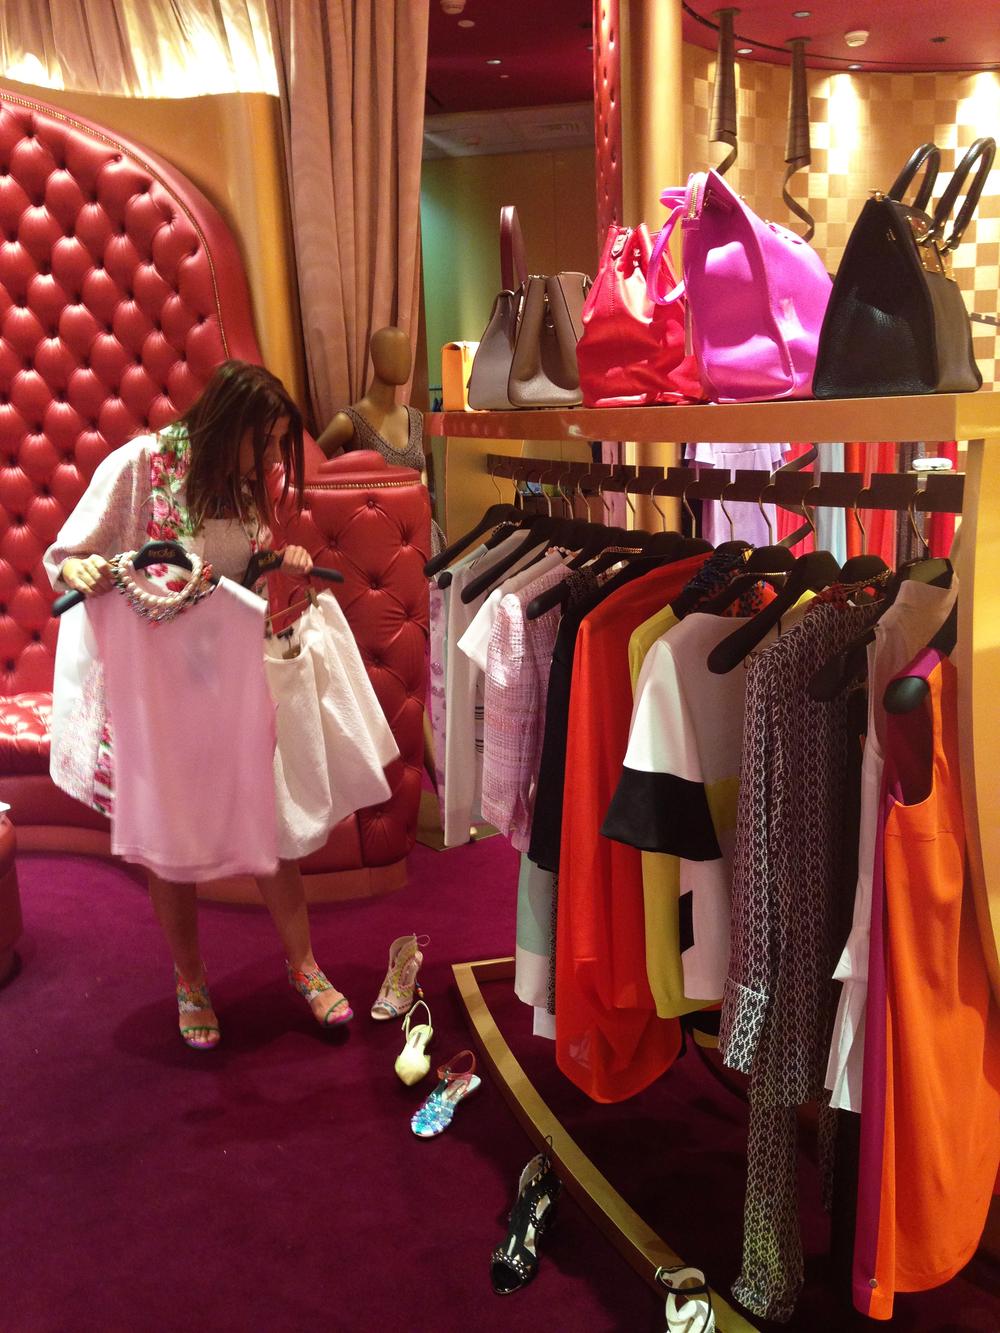 etoile_personal shopping2.jpg